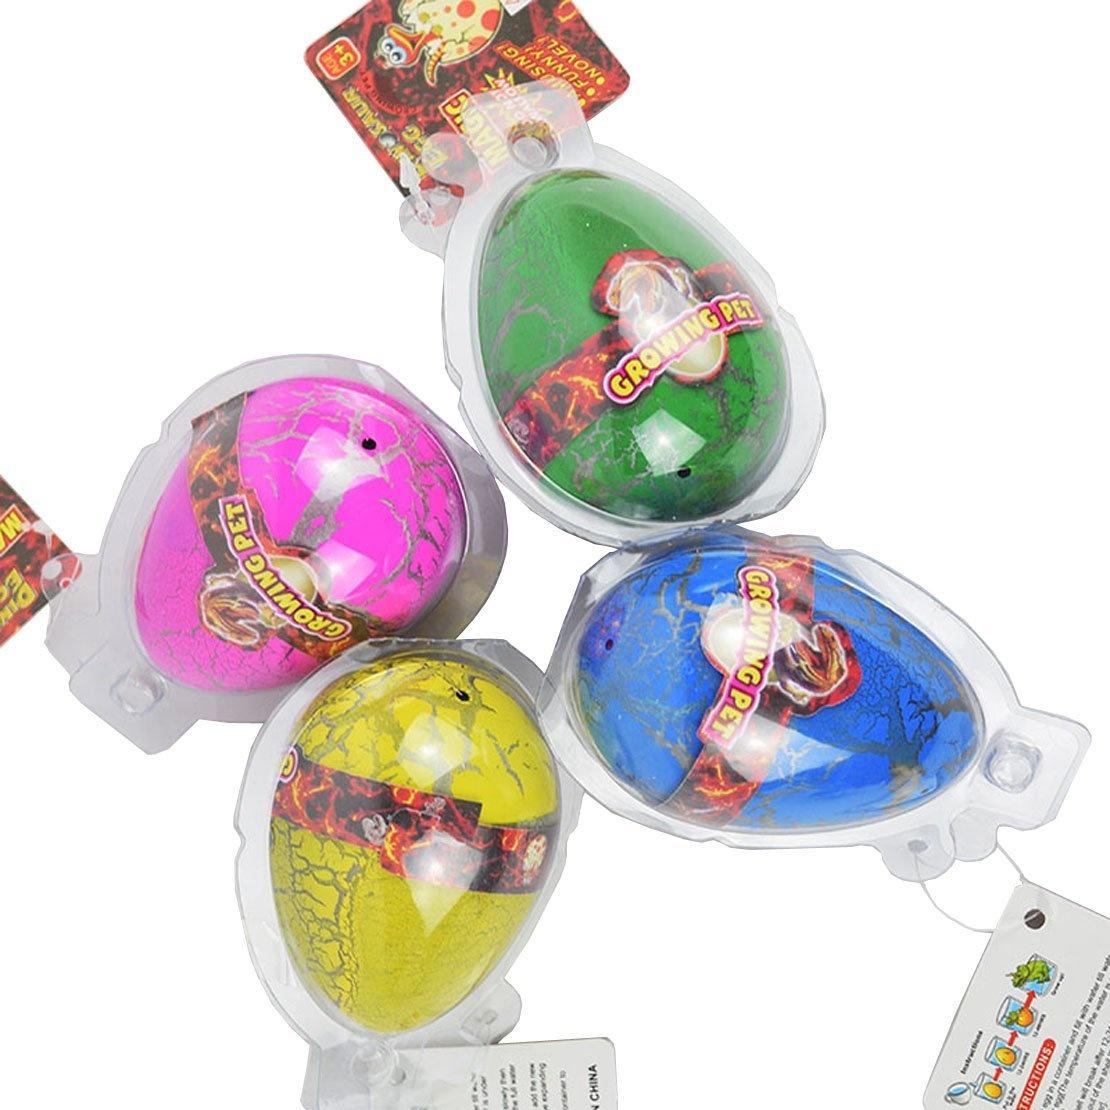 Dino Dinosaur Dragon Eggs Hatching Growing Toy Large Size Pack of  6pcs,colourful crack by Yeelan